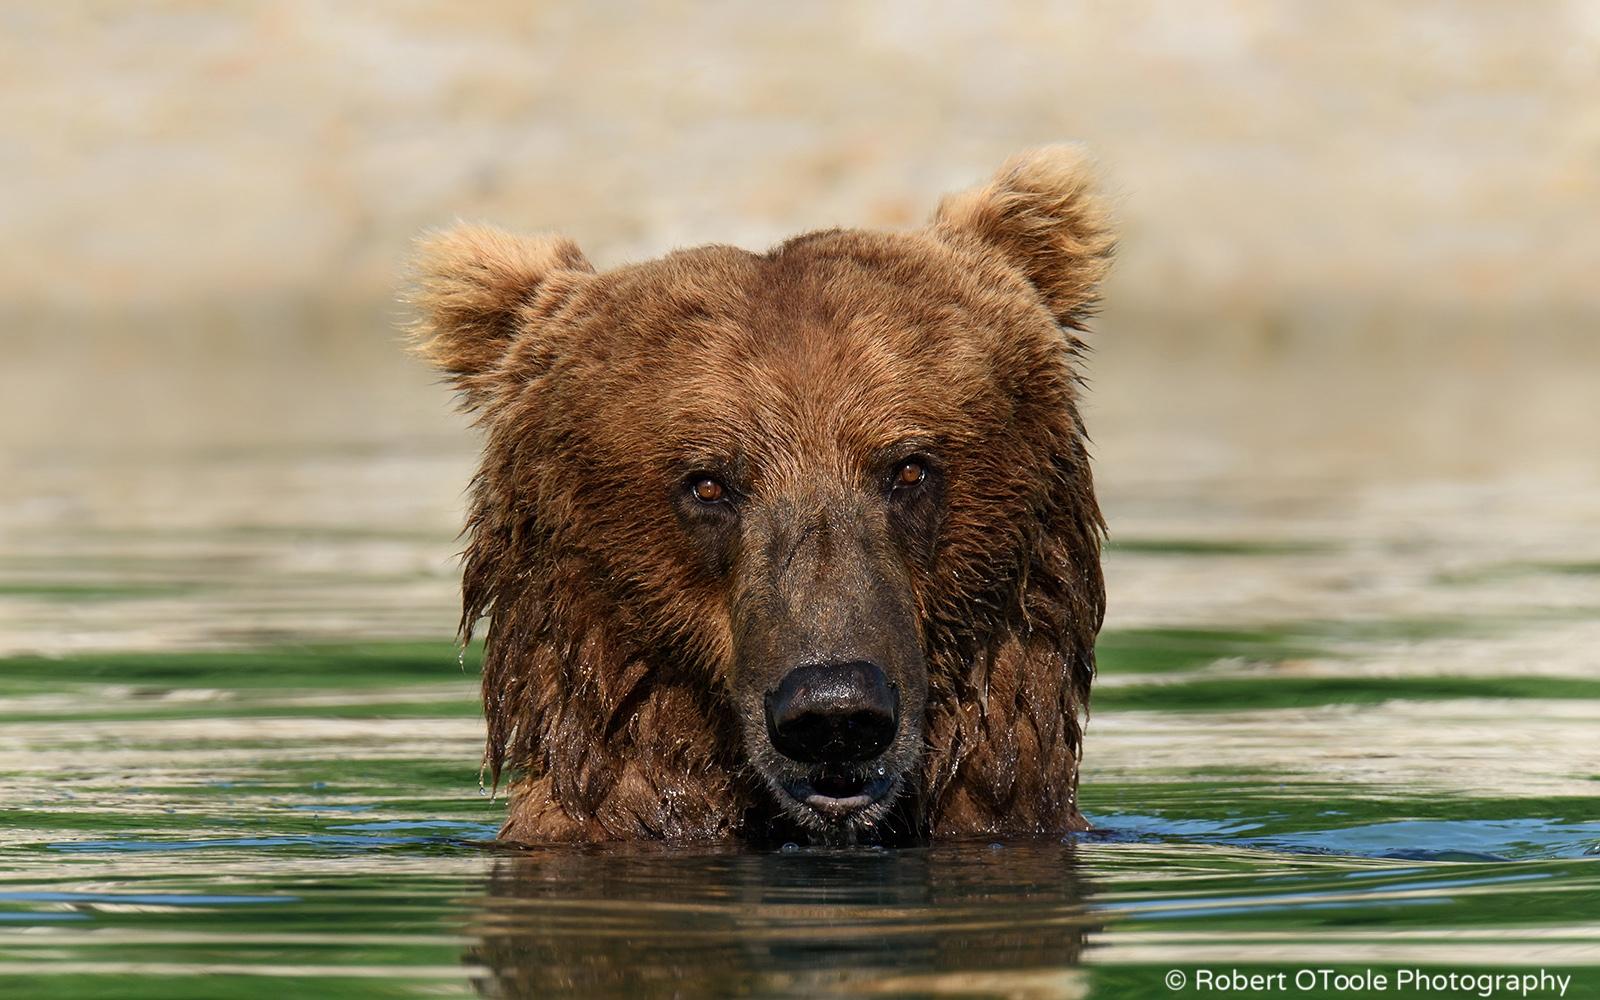 Brown Bear in Water Staring at the Camera in Alaska